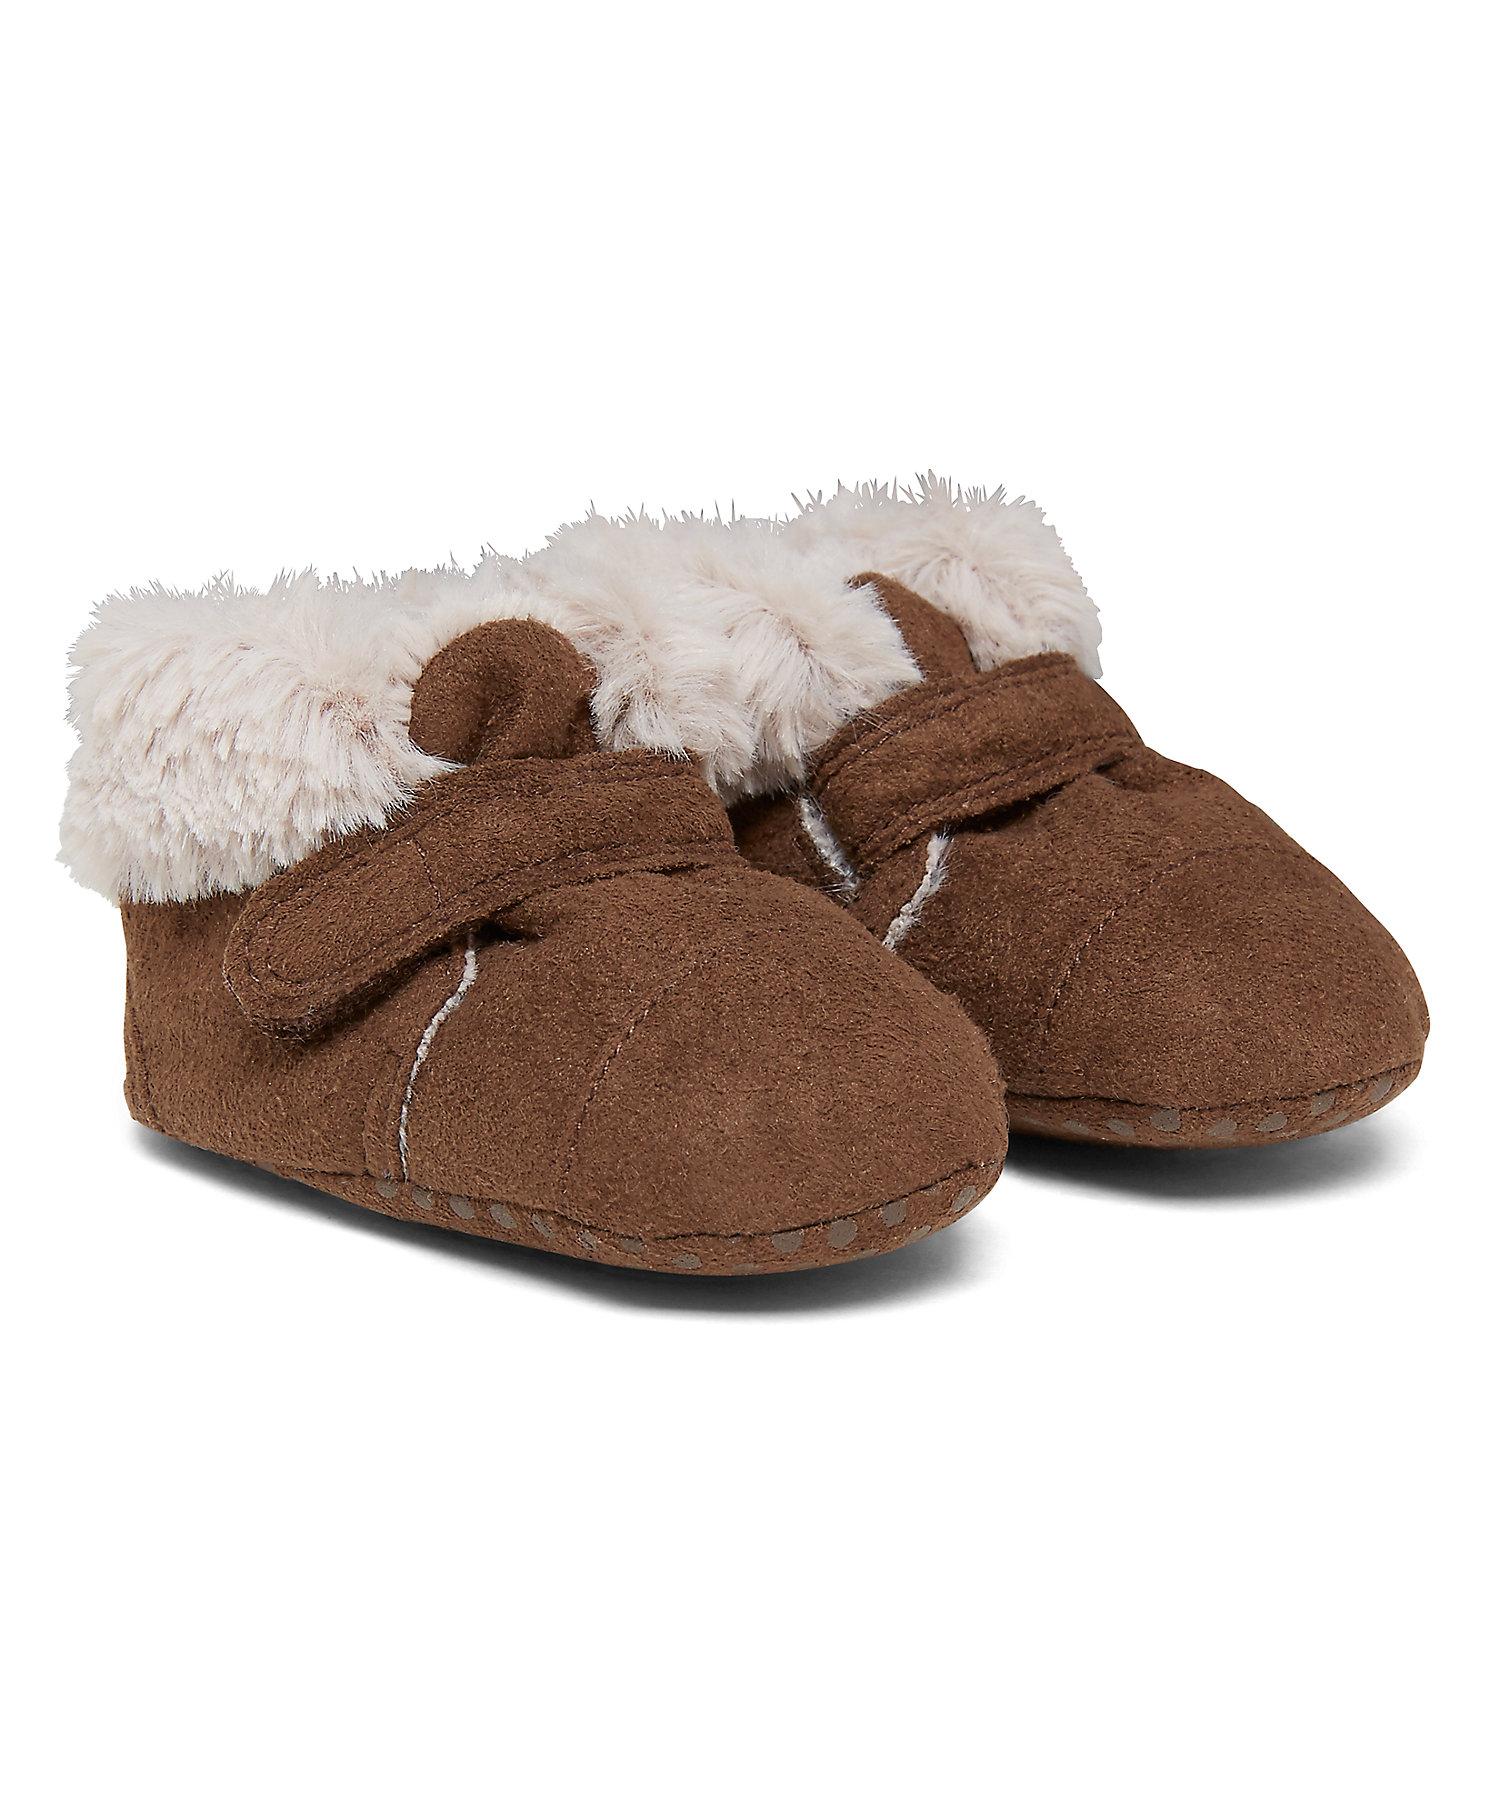 Mothercare | Boys Pram Shoes Fur Detail - Brown